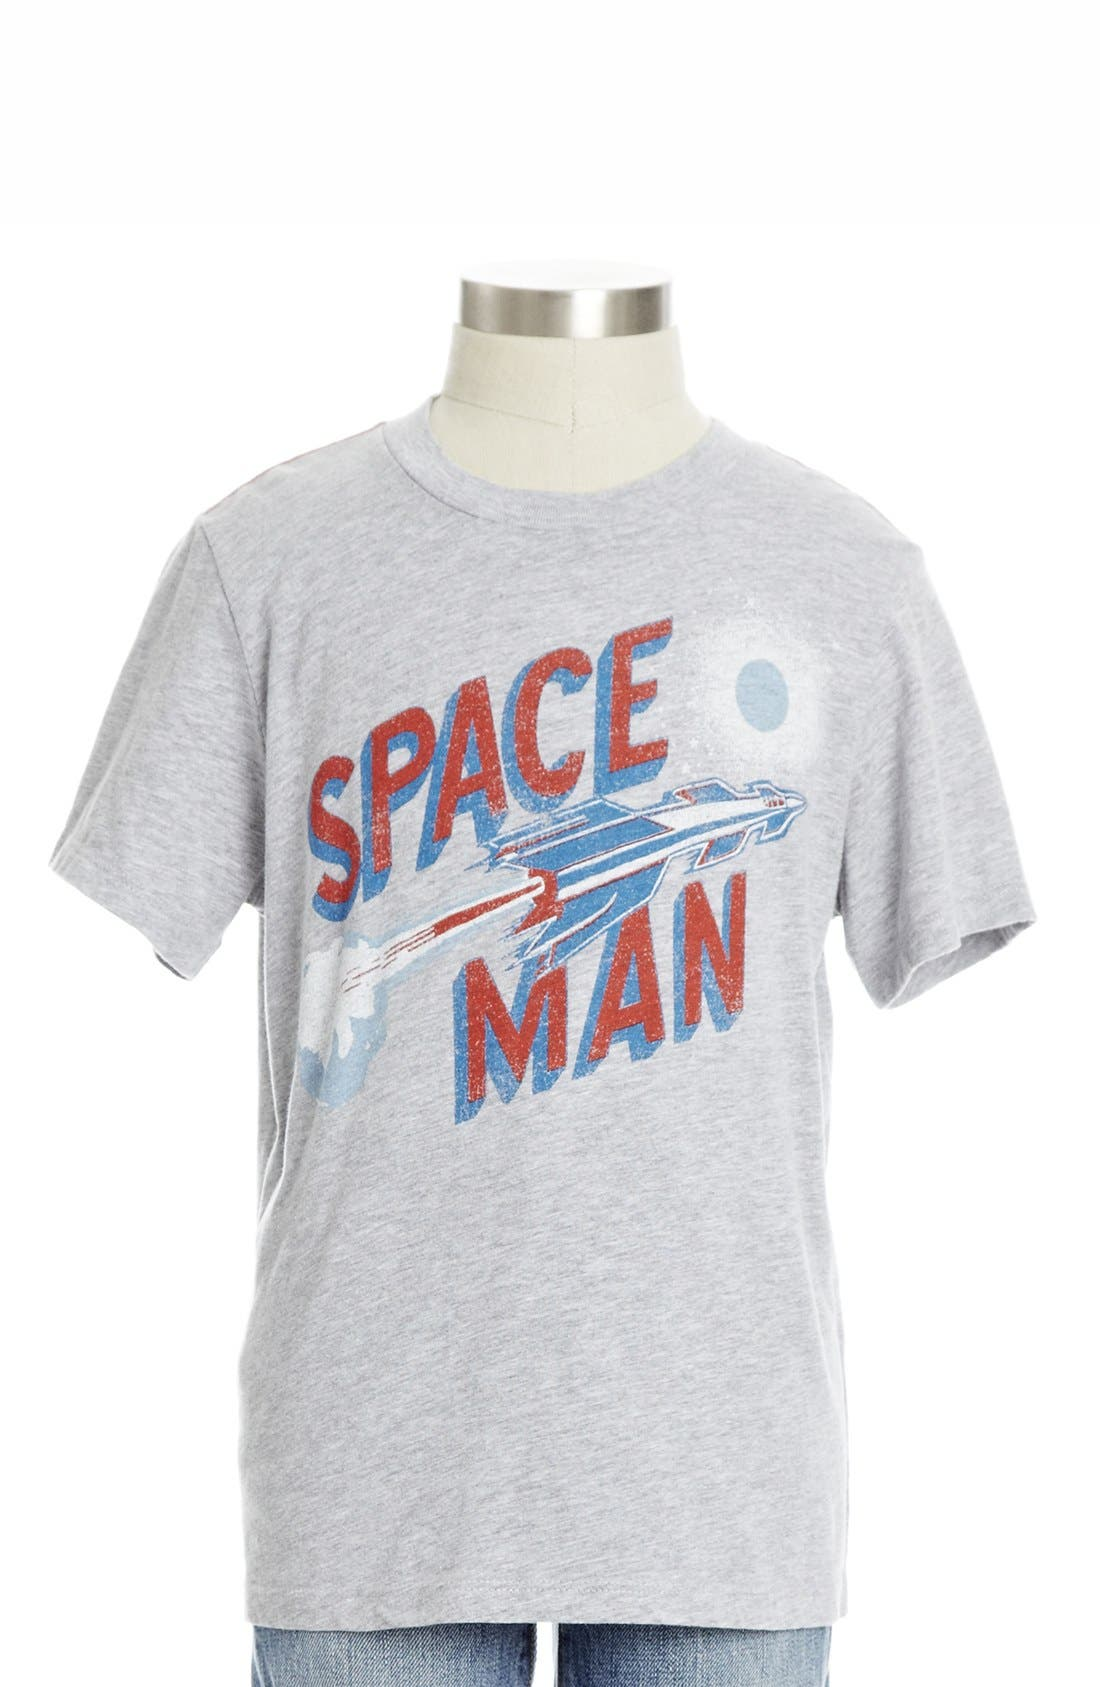 Main Image - Peek 'Space Man' Crewneck T-Shirt (Toddler Boys, Little Boys & Big Boys)